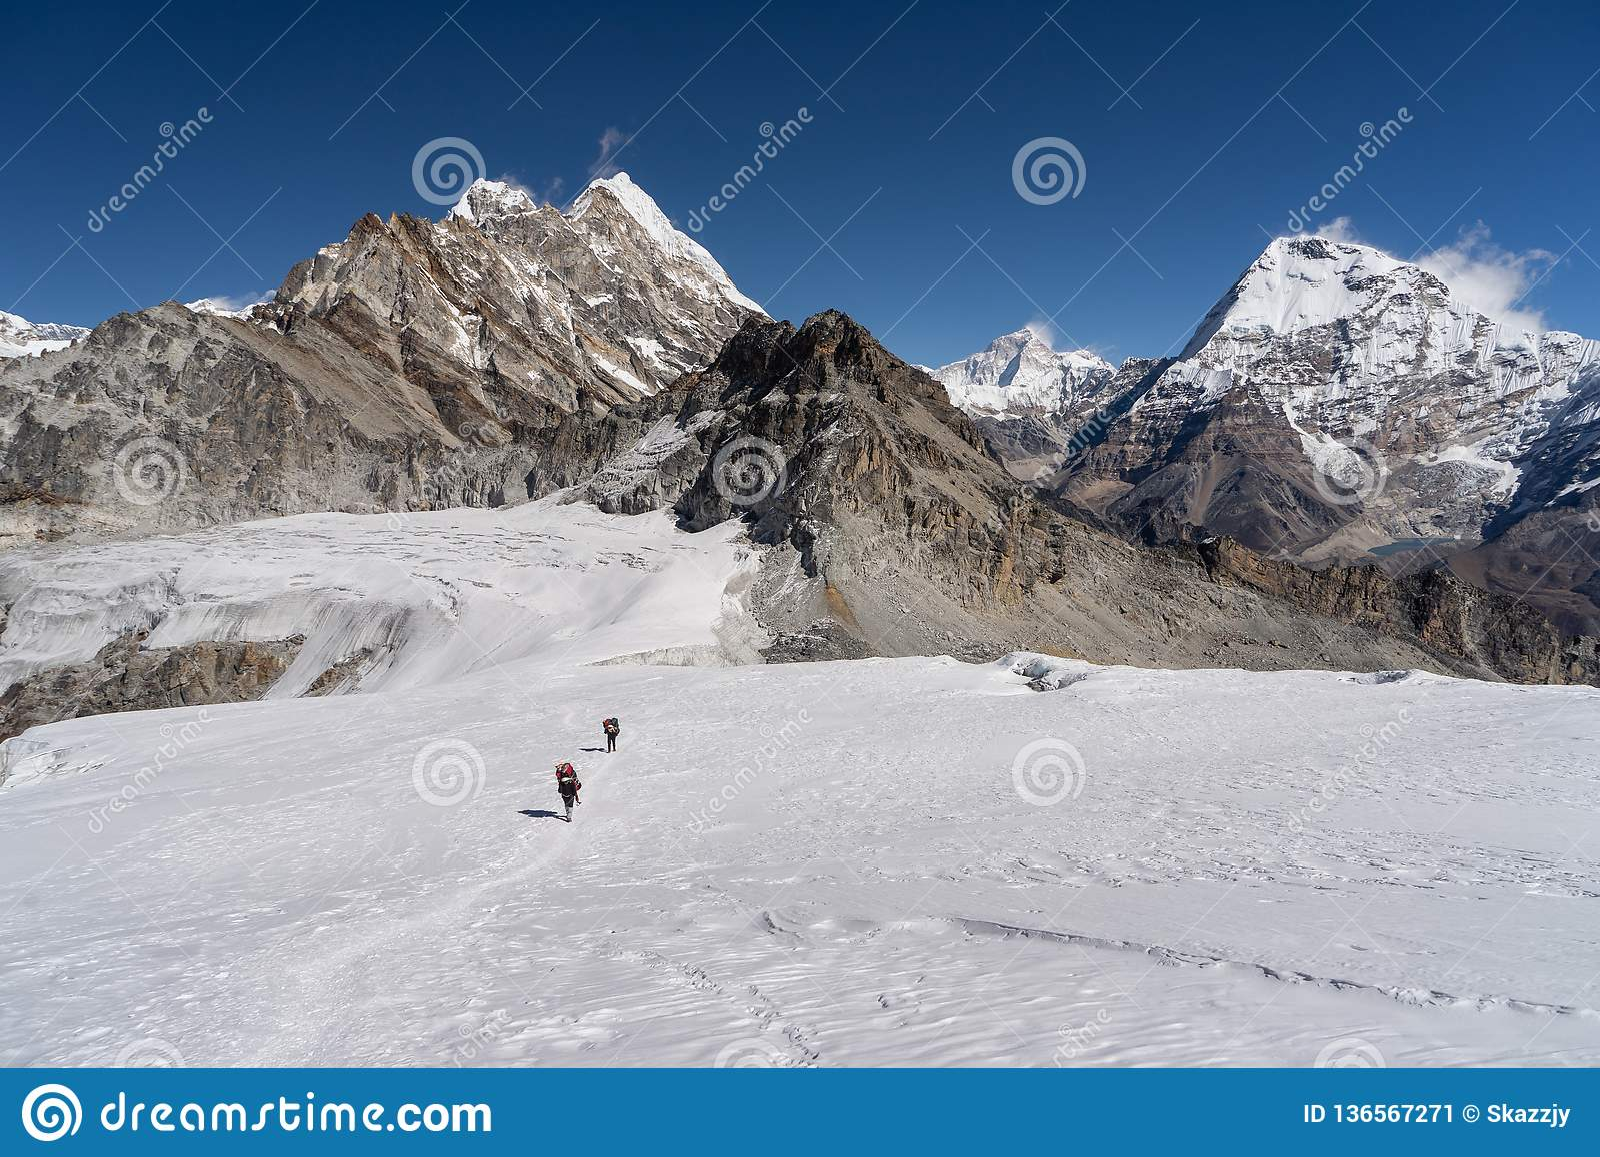 Trail from Mera peak base camp to Mera peak high camp walk on glacier, Khumbu region Himalayas mountain, Nepal